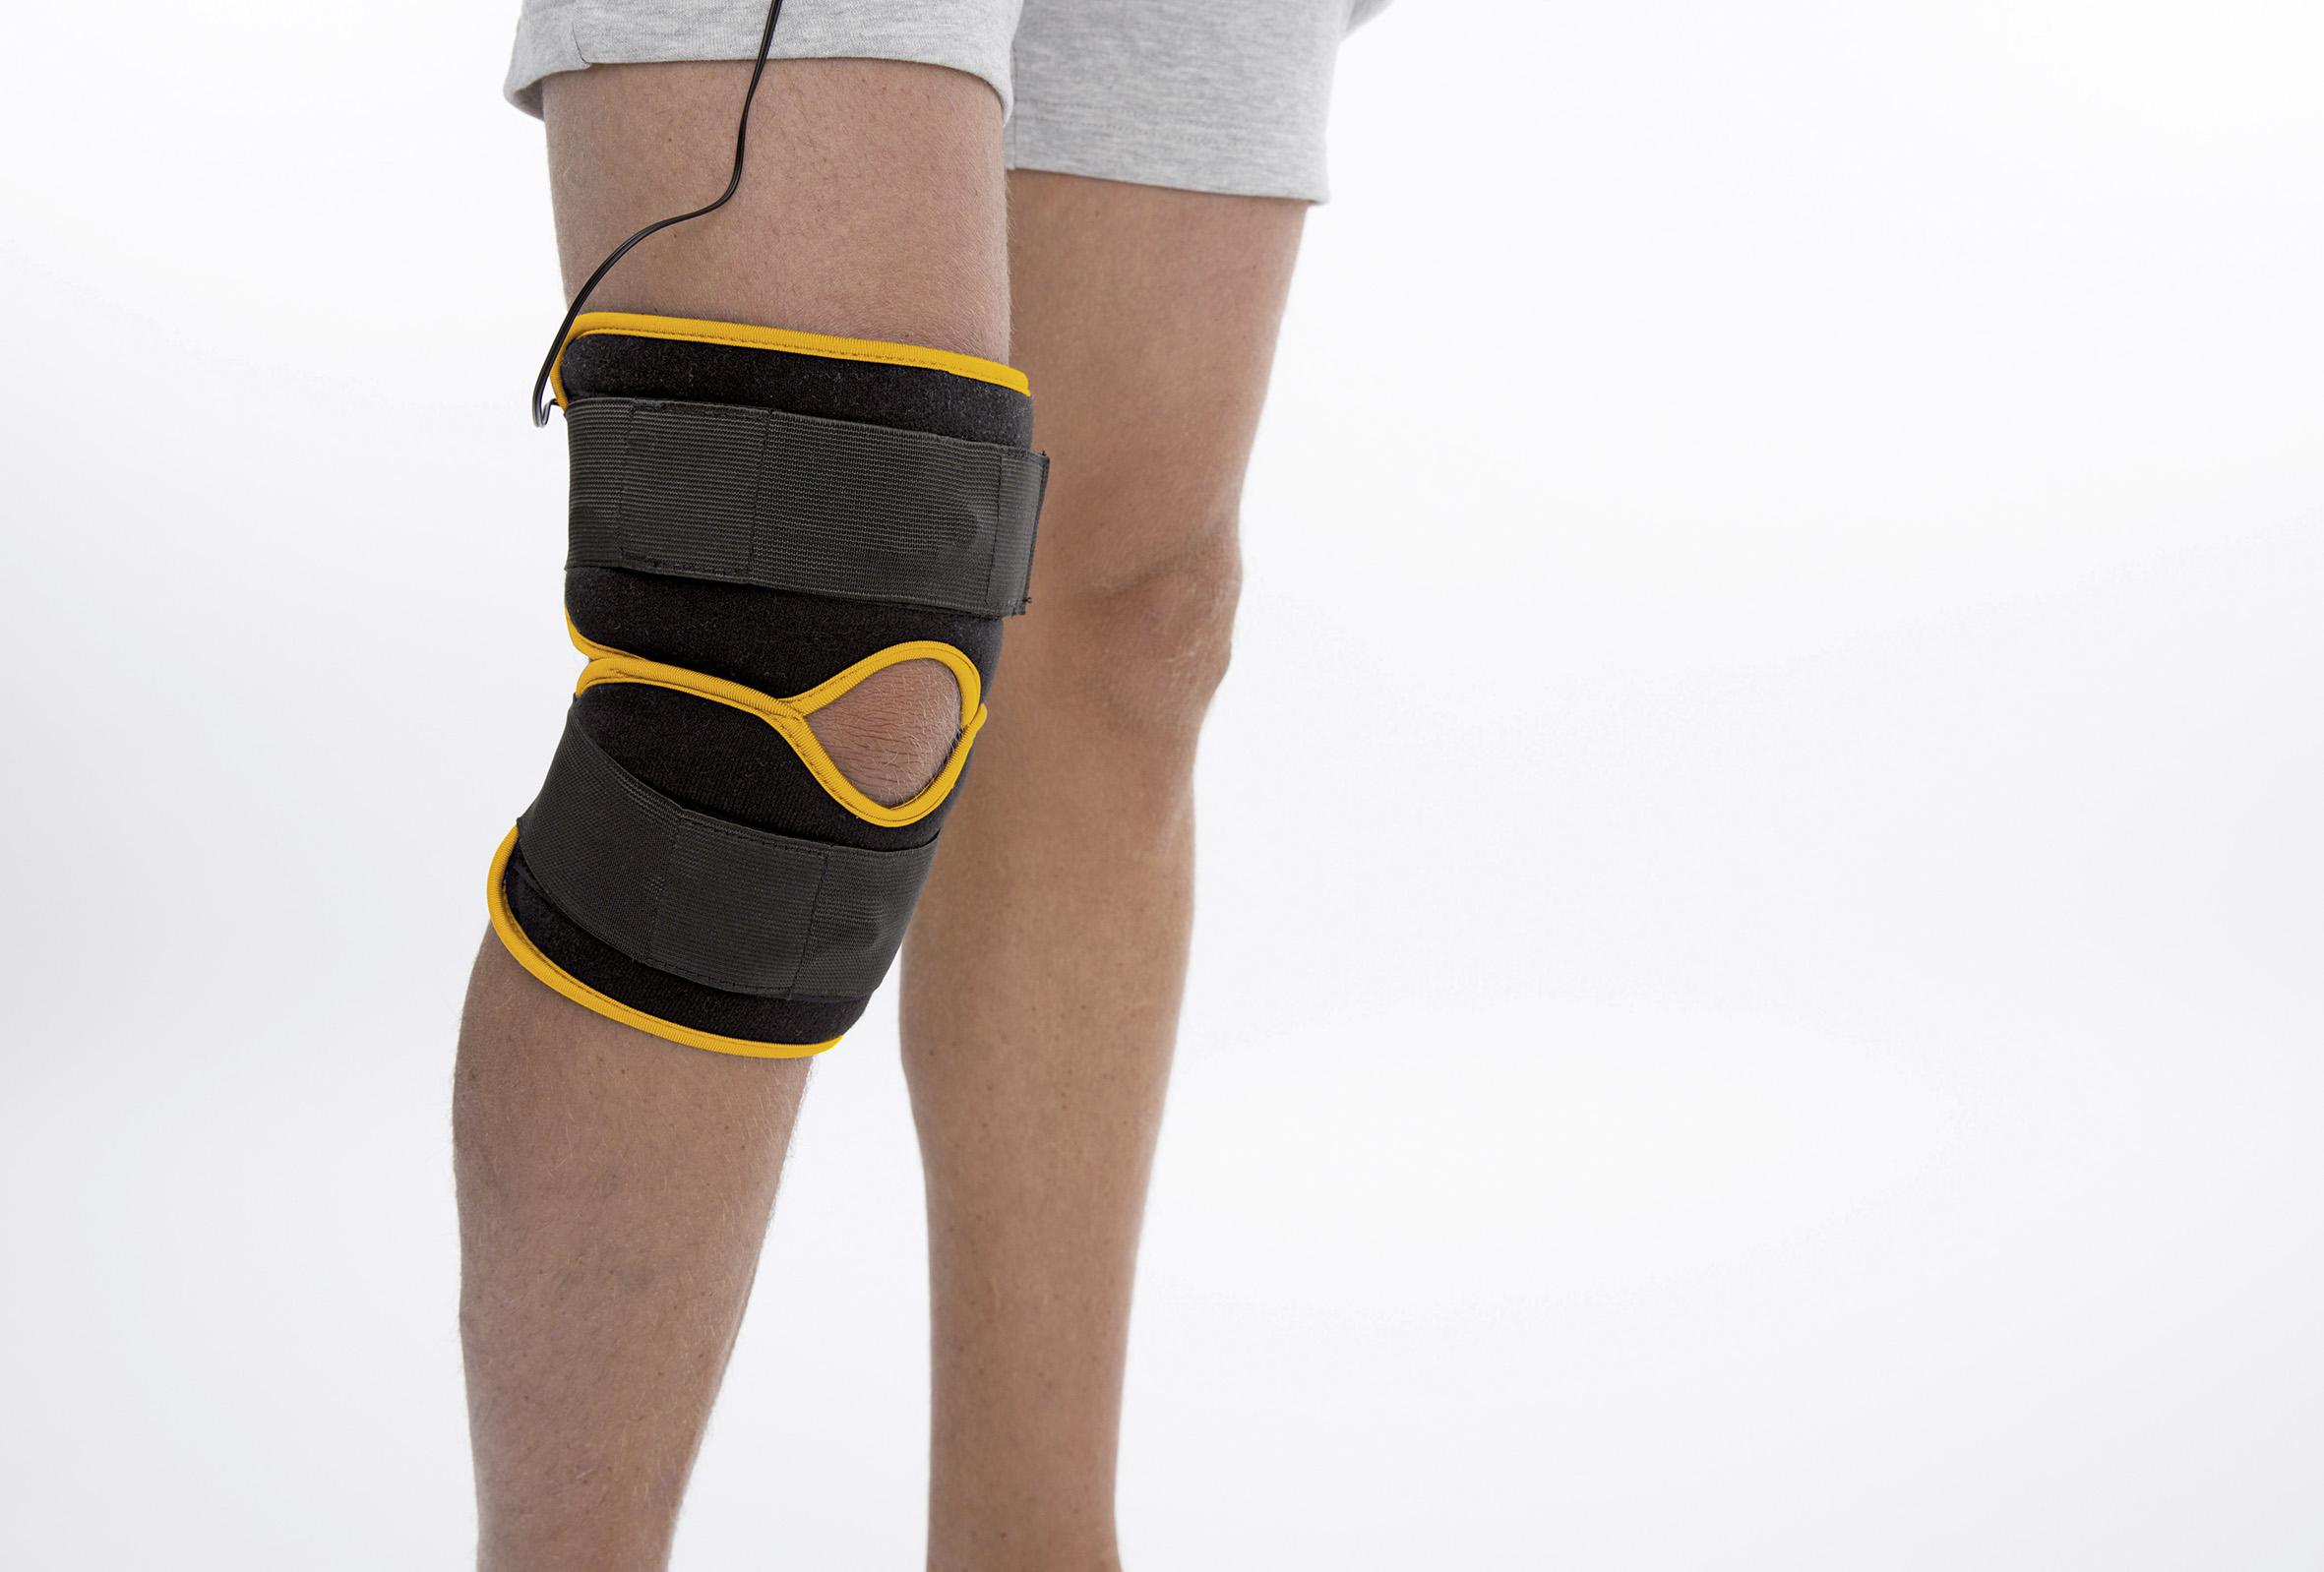 Beurer EM 29 2-in-1 knee and elbow TENS